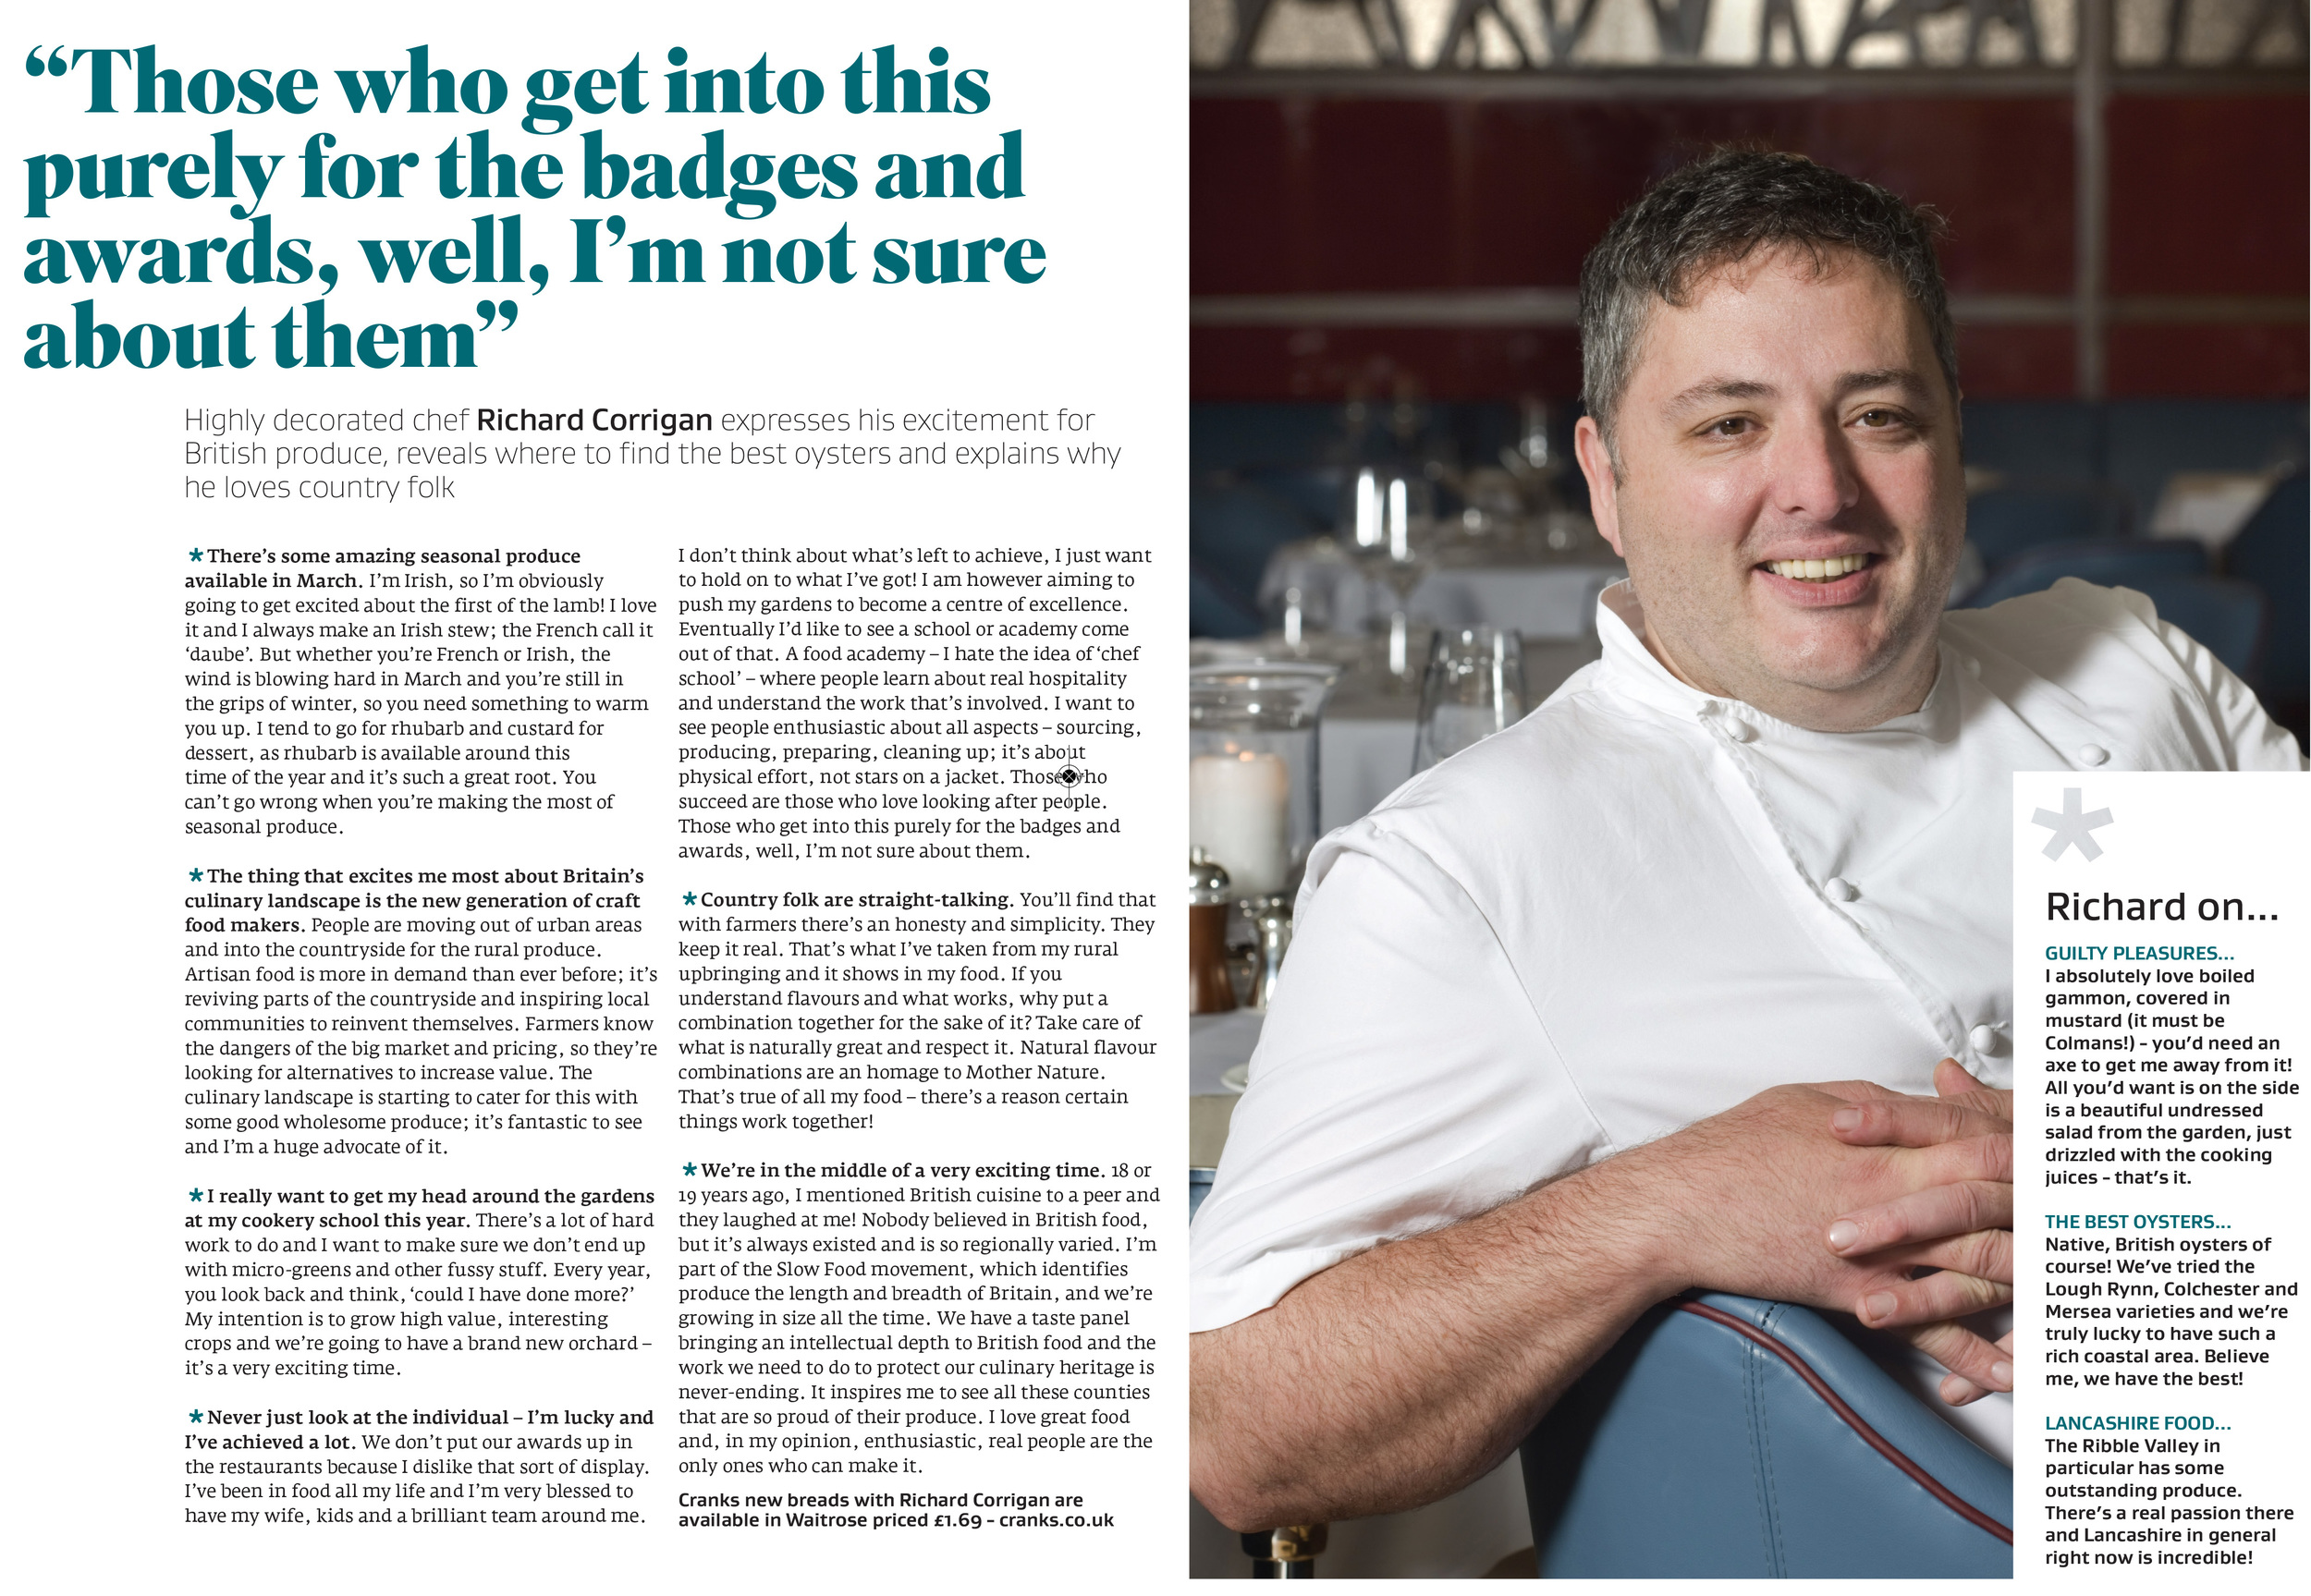 Interview with Richard Corrigan in Great British Food